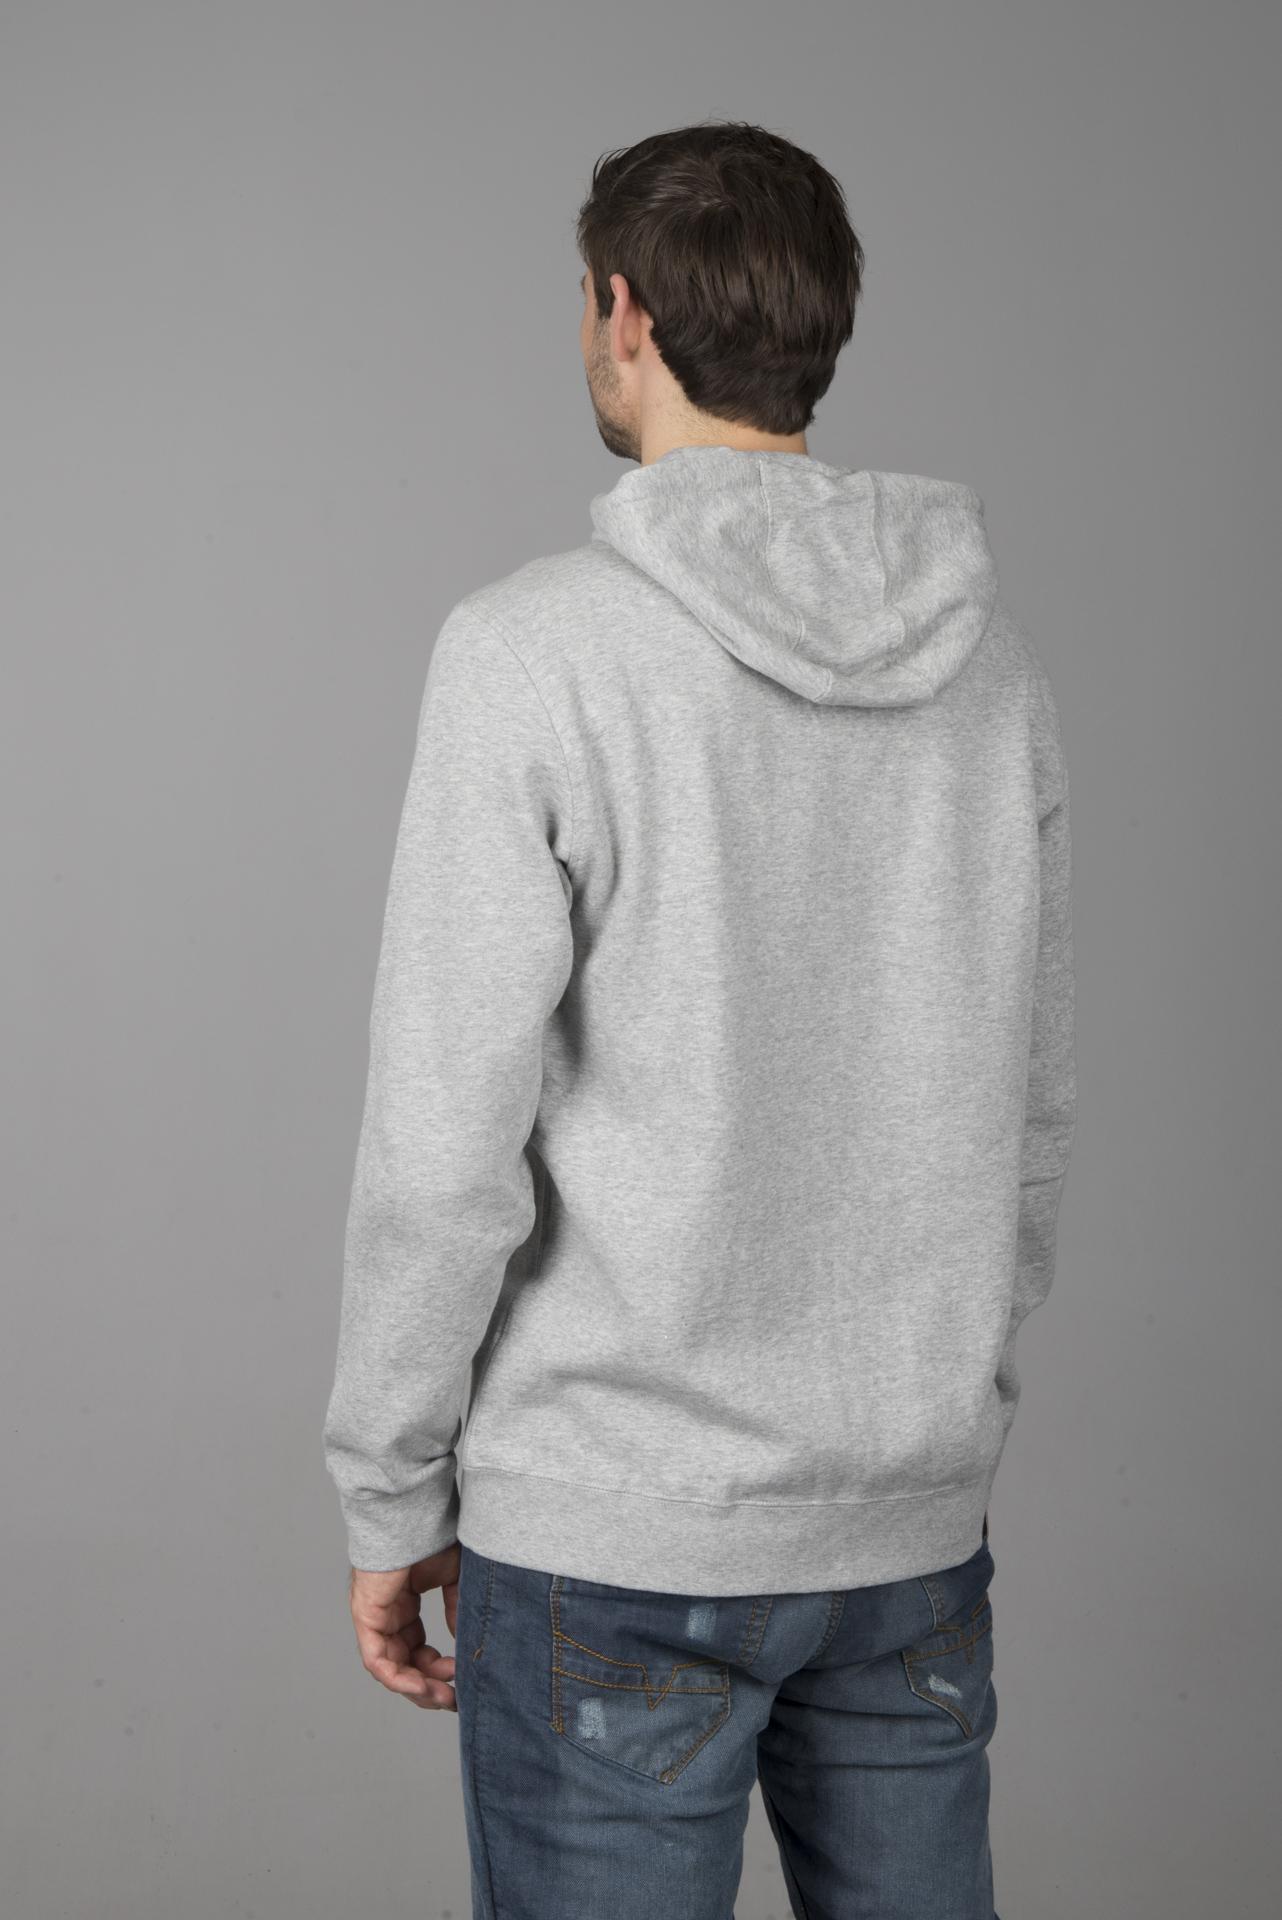 Choose Size Black//White Alpinestars BLAZE Fleece Pullover Hoody Sweatshirt